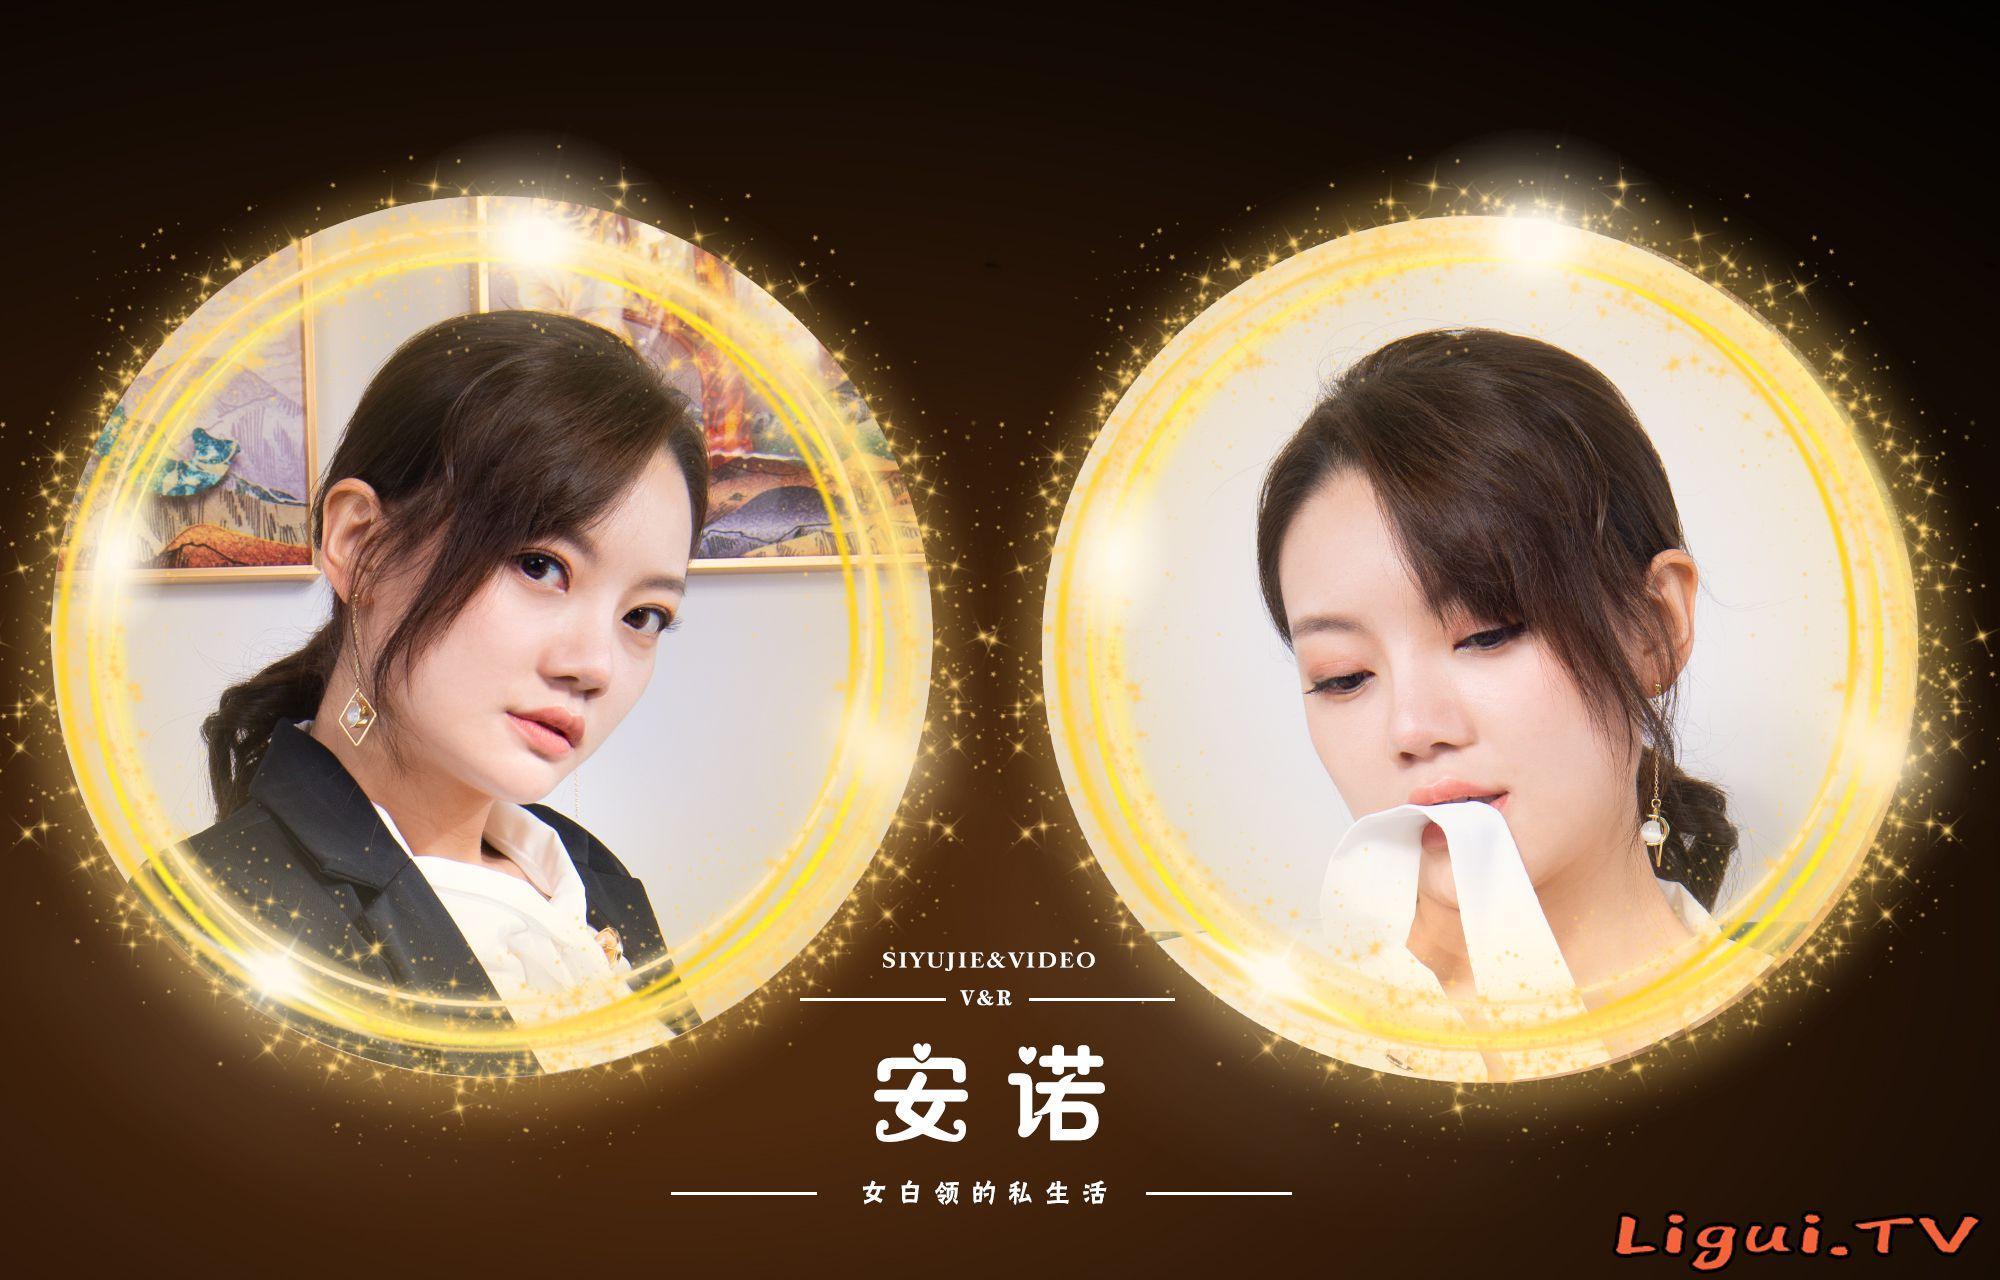 [Ligui丽柜] 2021.10.04 丝语界 VR视频 《女白领的私生活-VR》 安诺